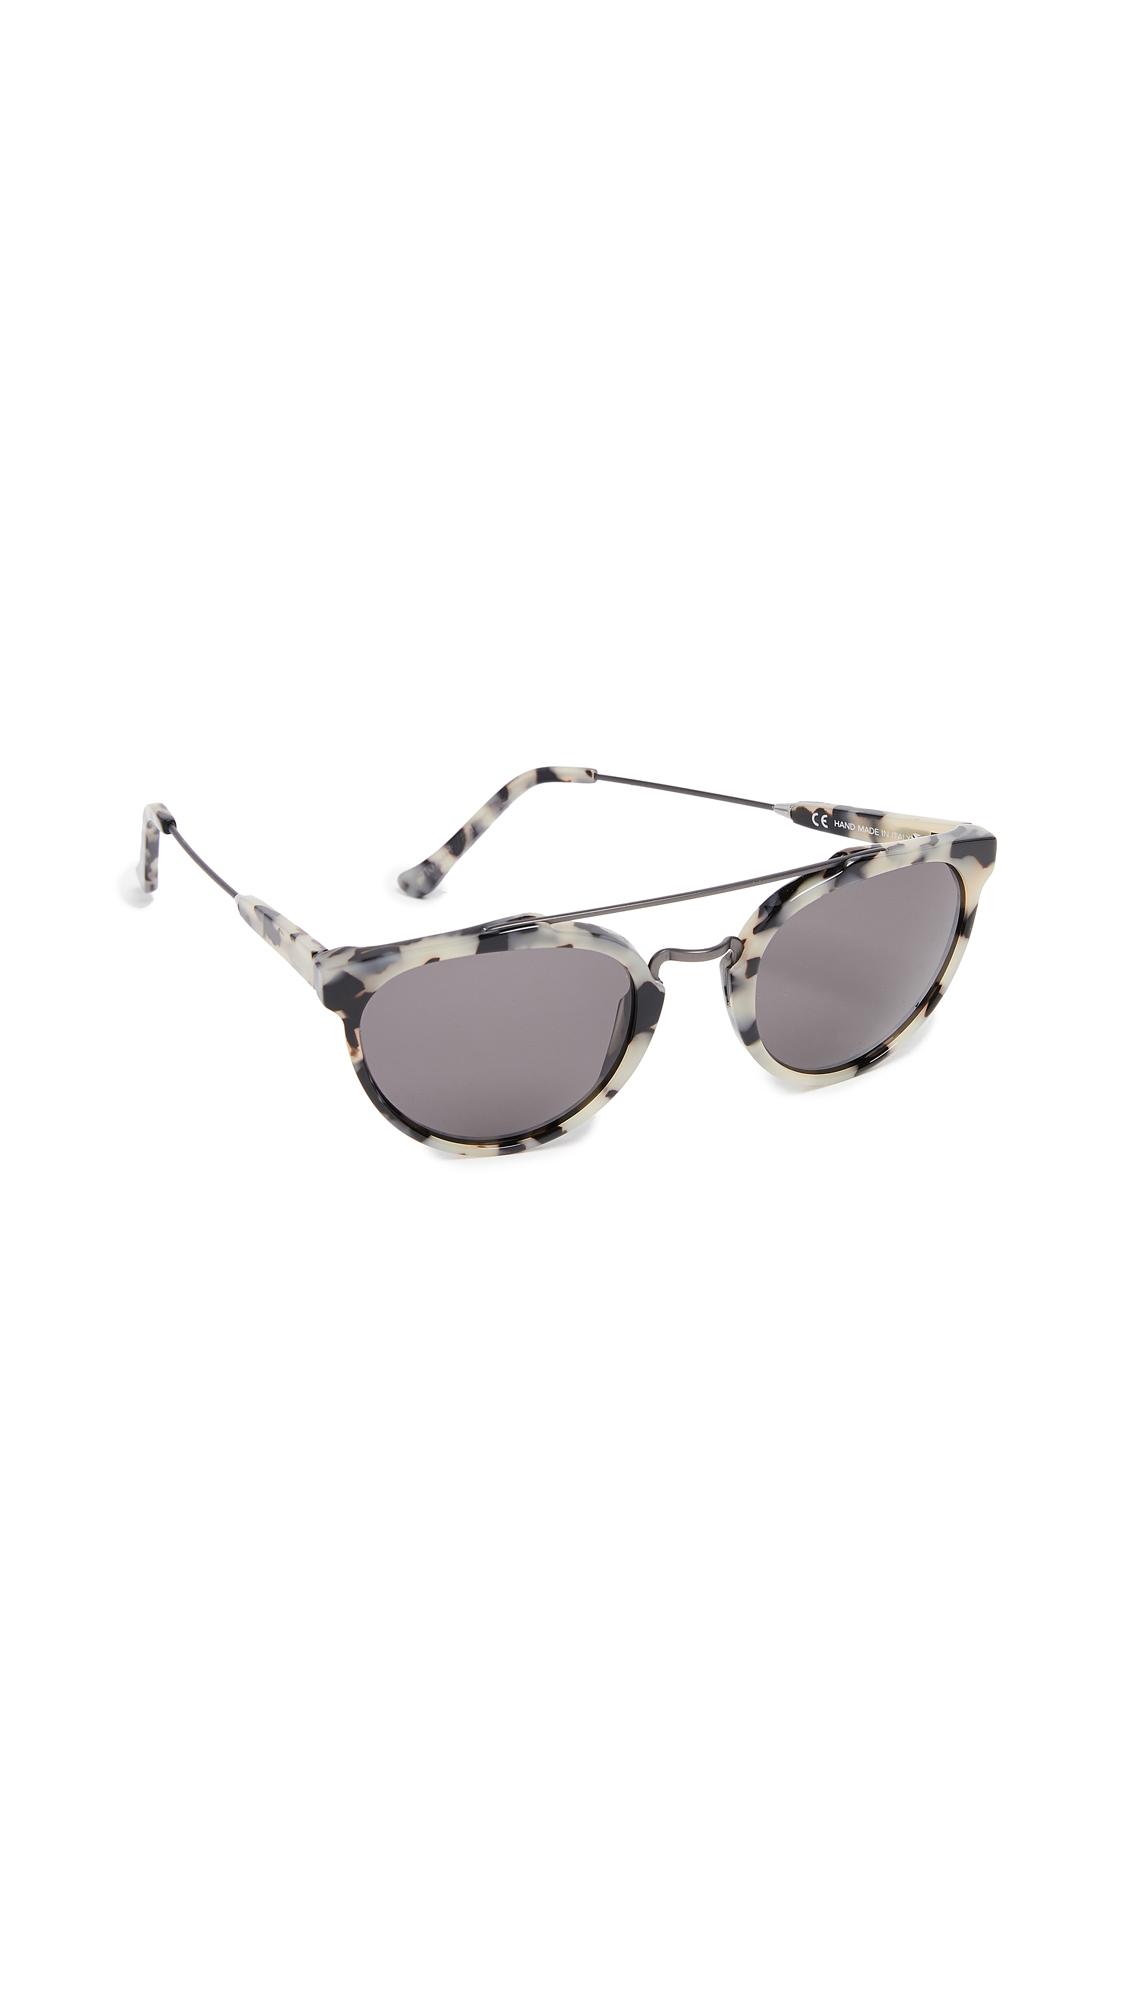 SUPER SUNGLASSES Giaguaro Sunglasses in Puma